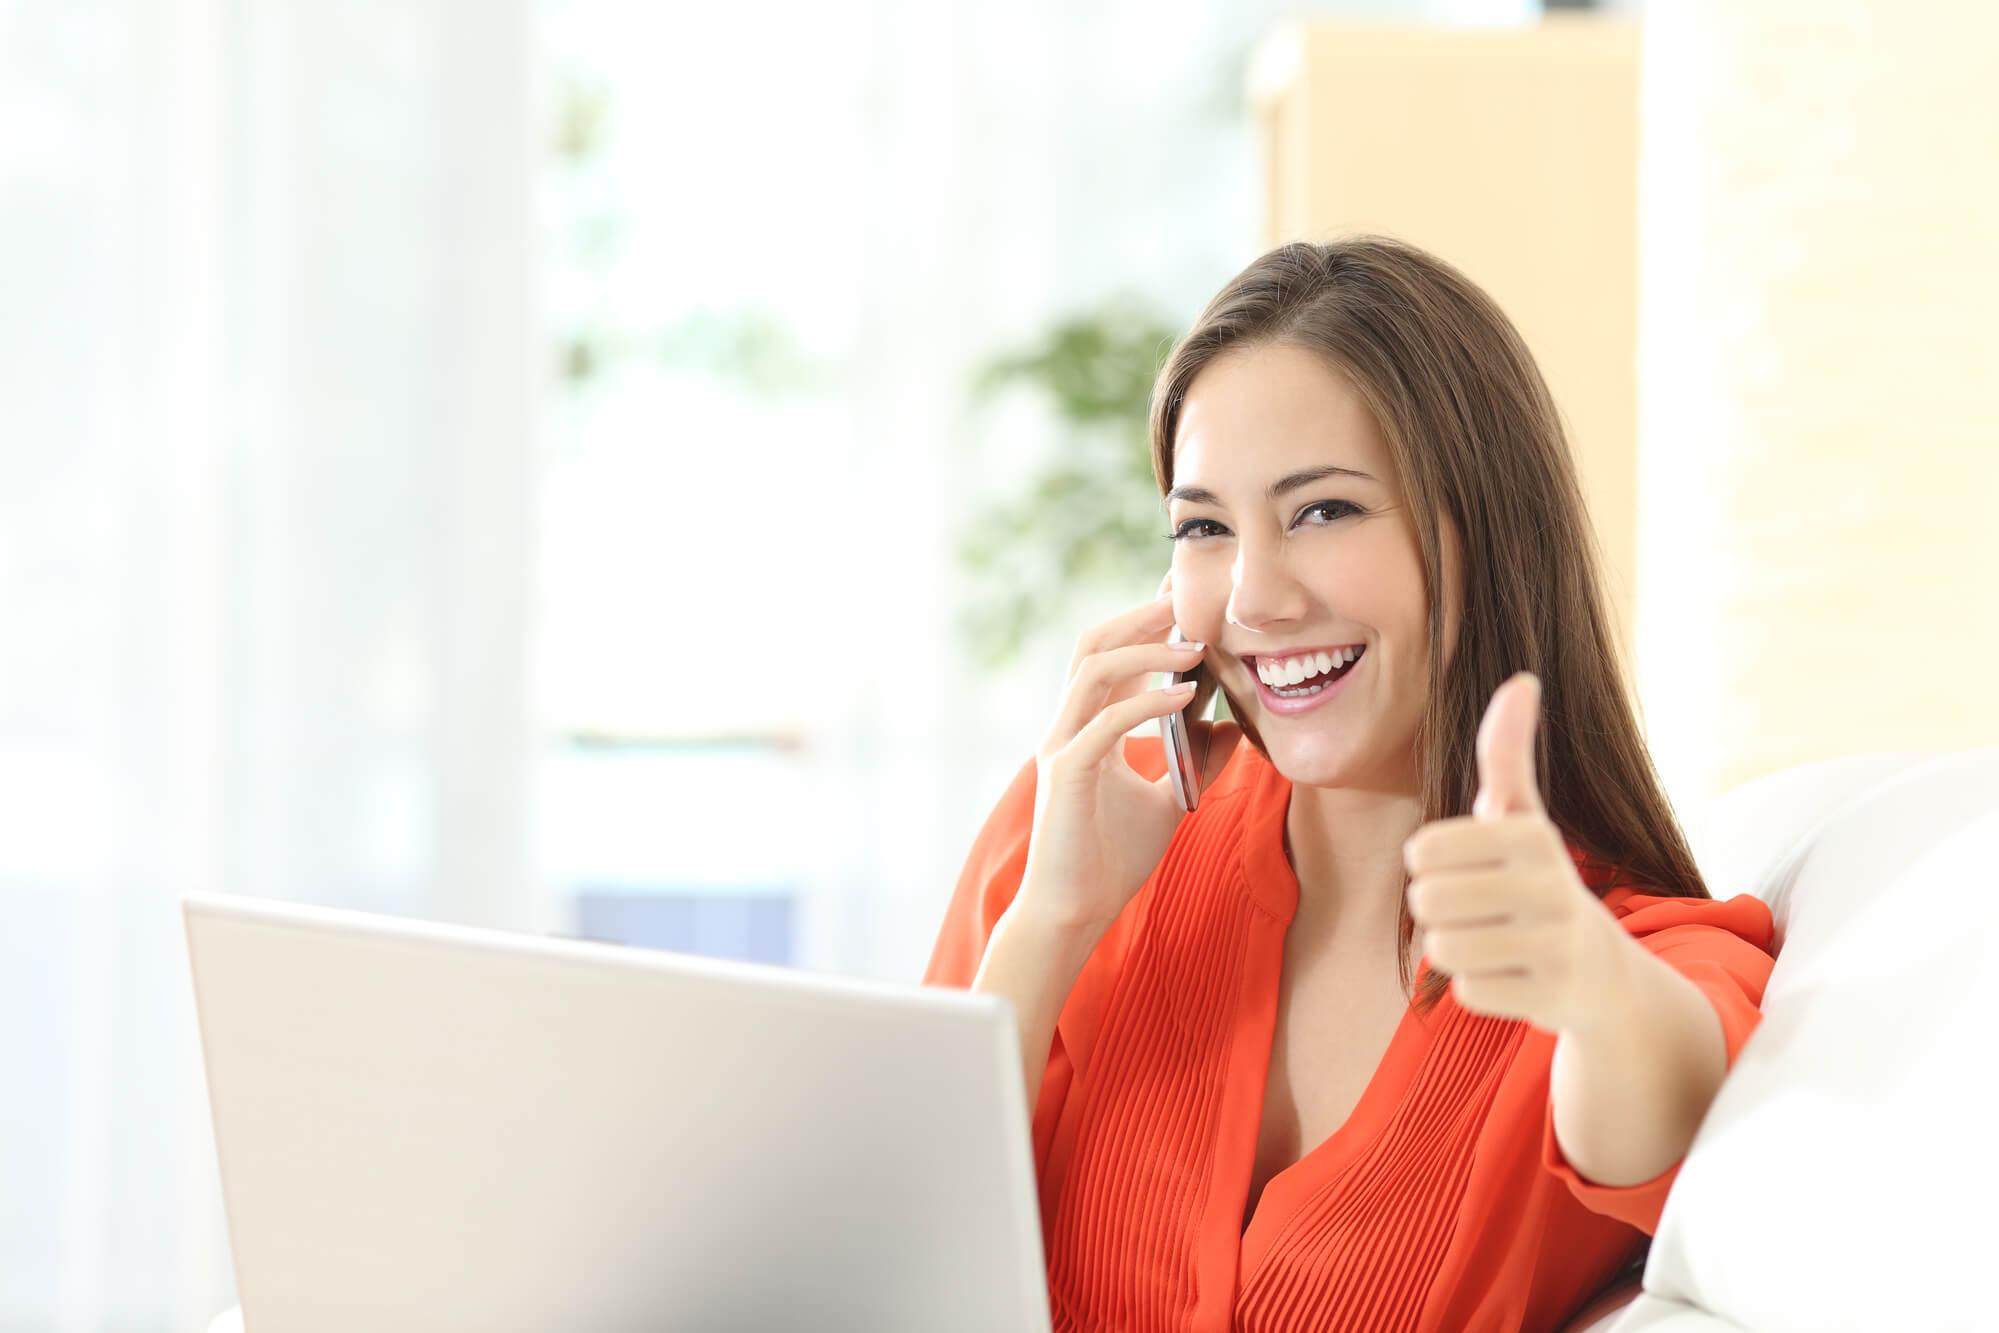 Customer Feedback Management: Focus On Your Detractors / CentraCX